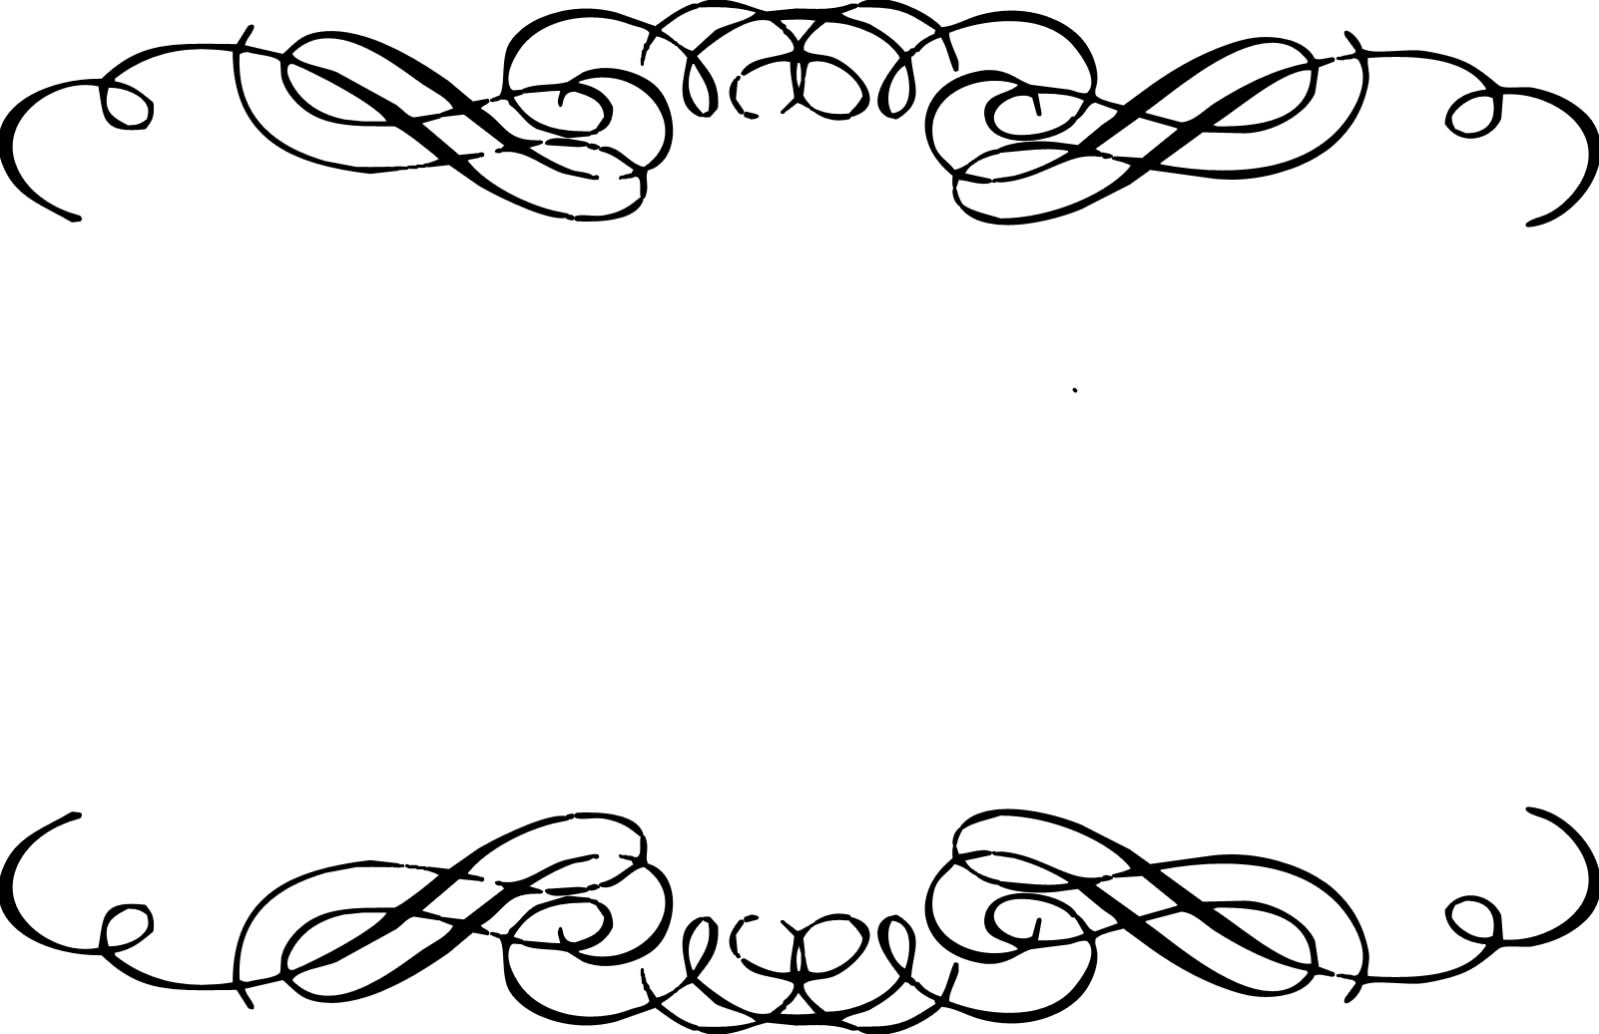 16 Graphic Swirl Borders Images